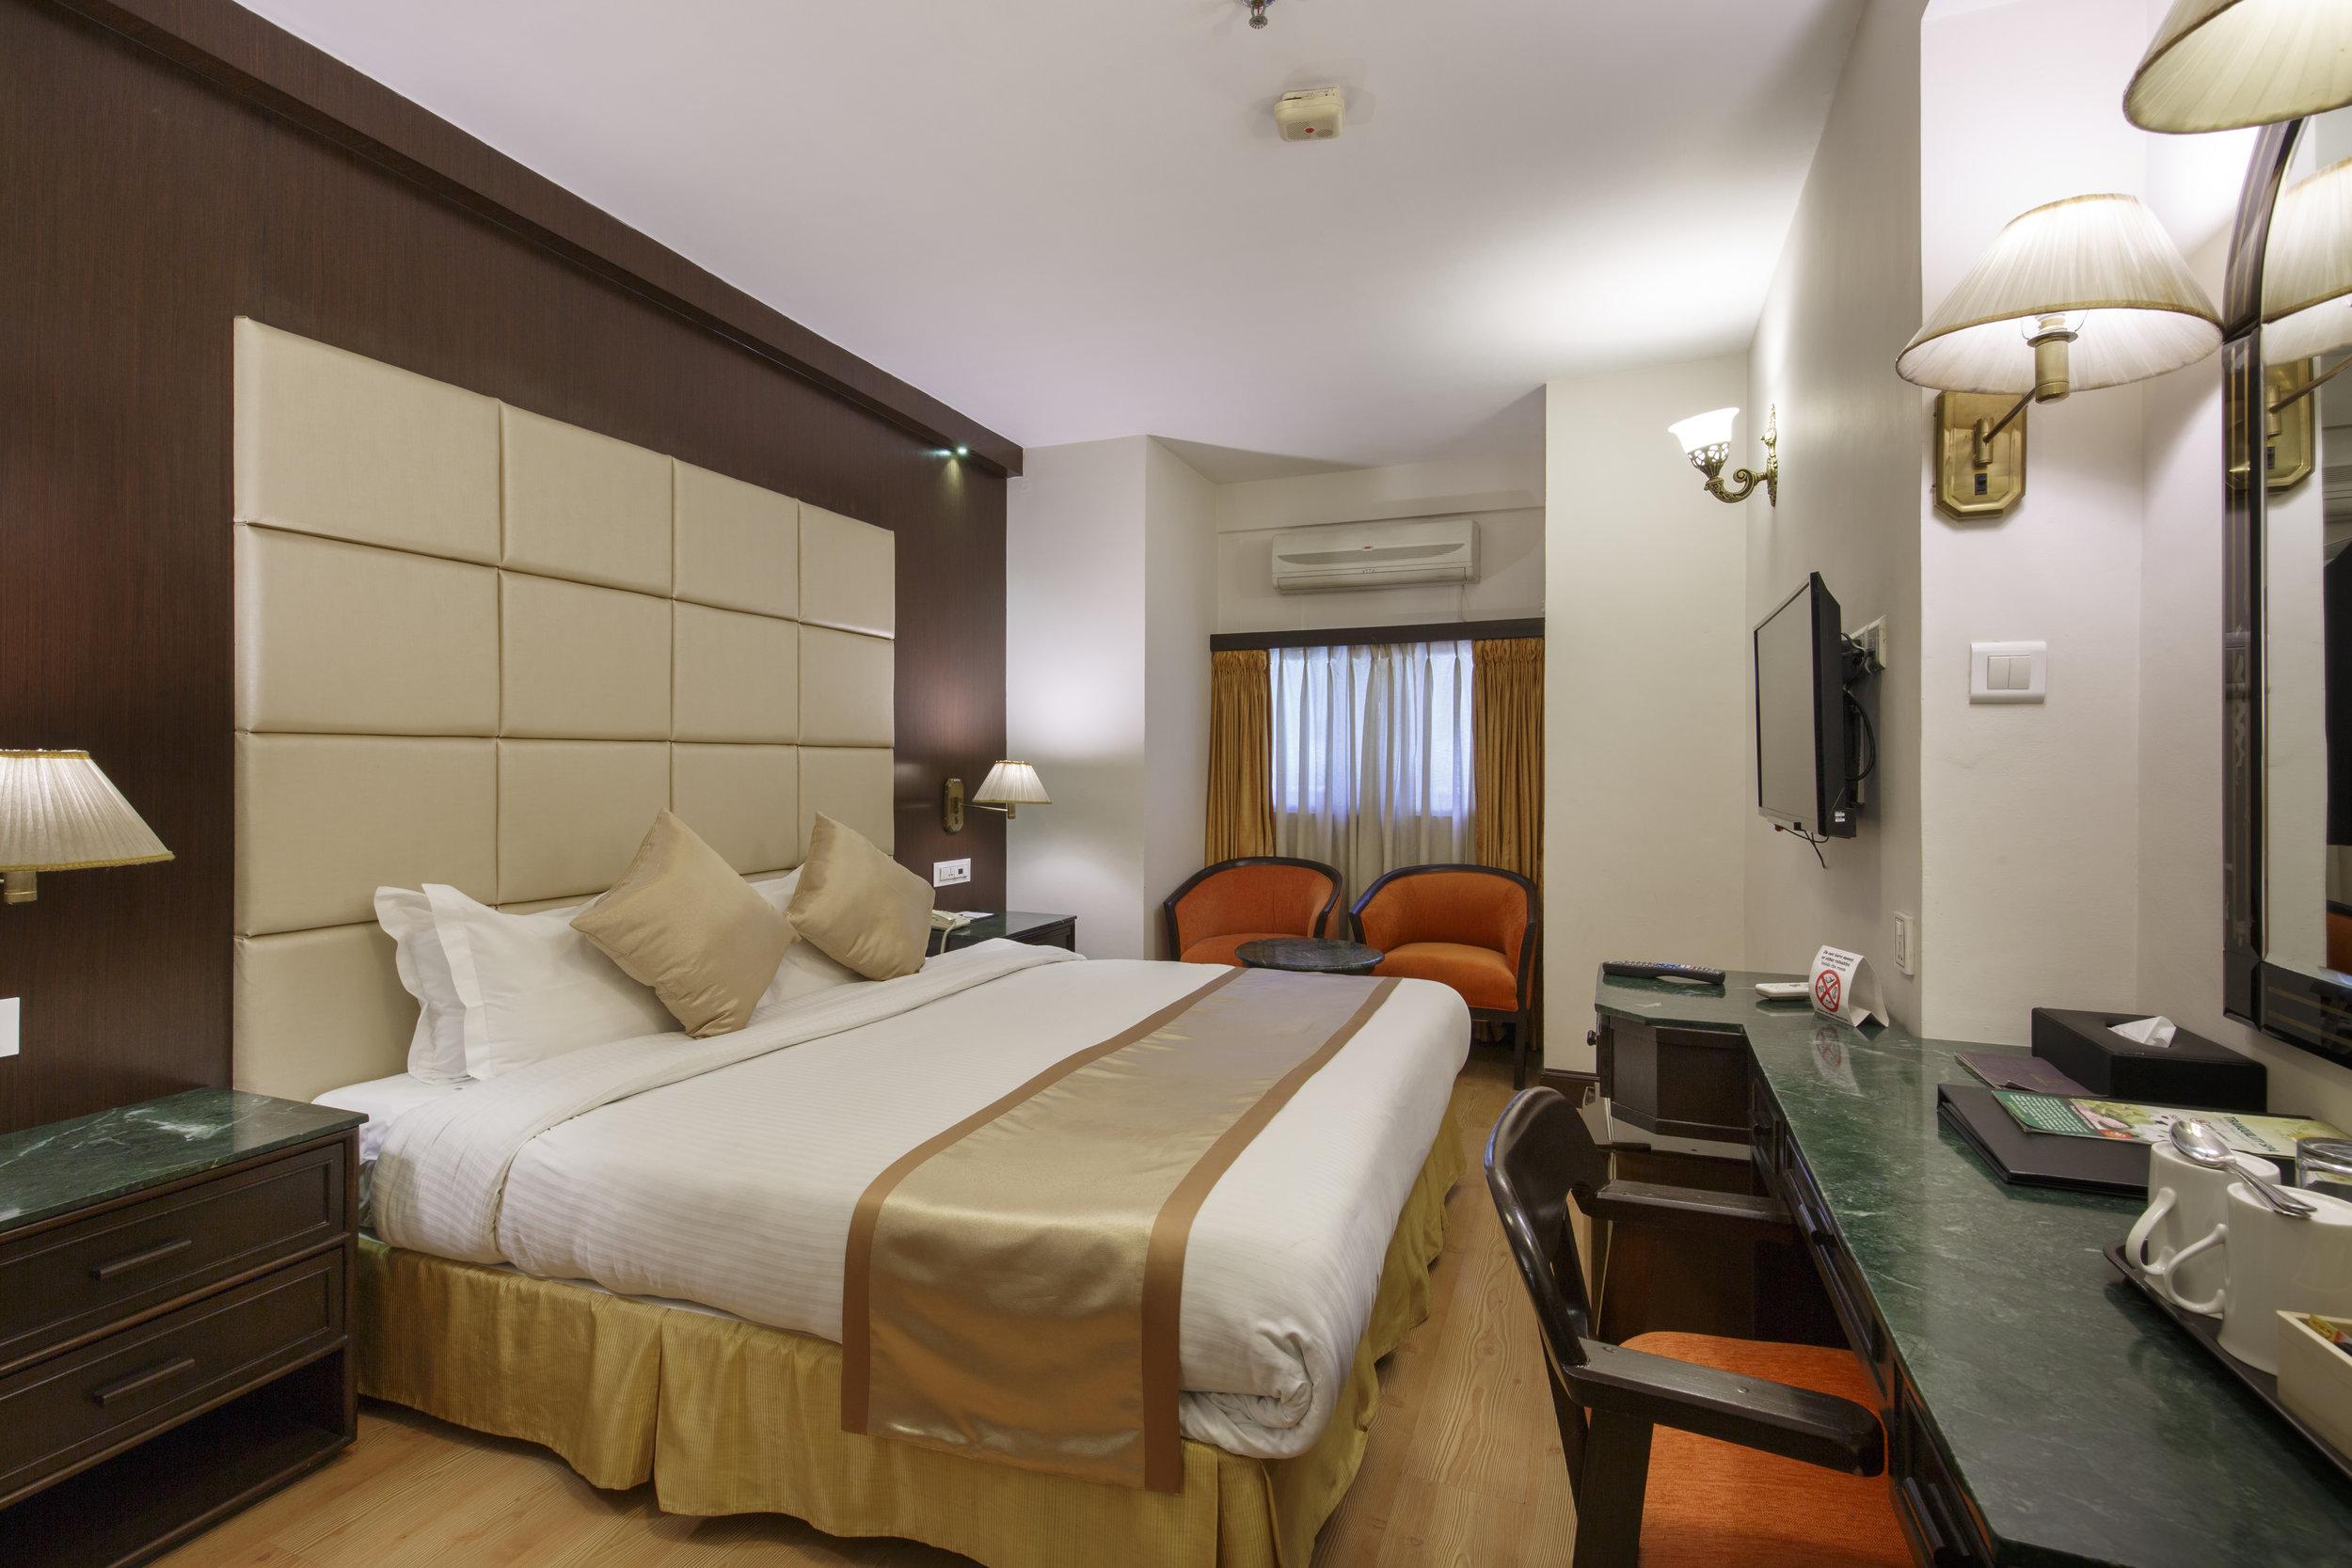 DELUXE SINGLE ROOMS (Queen Size Bed)